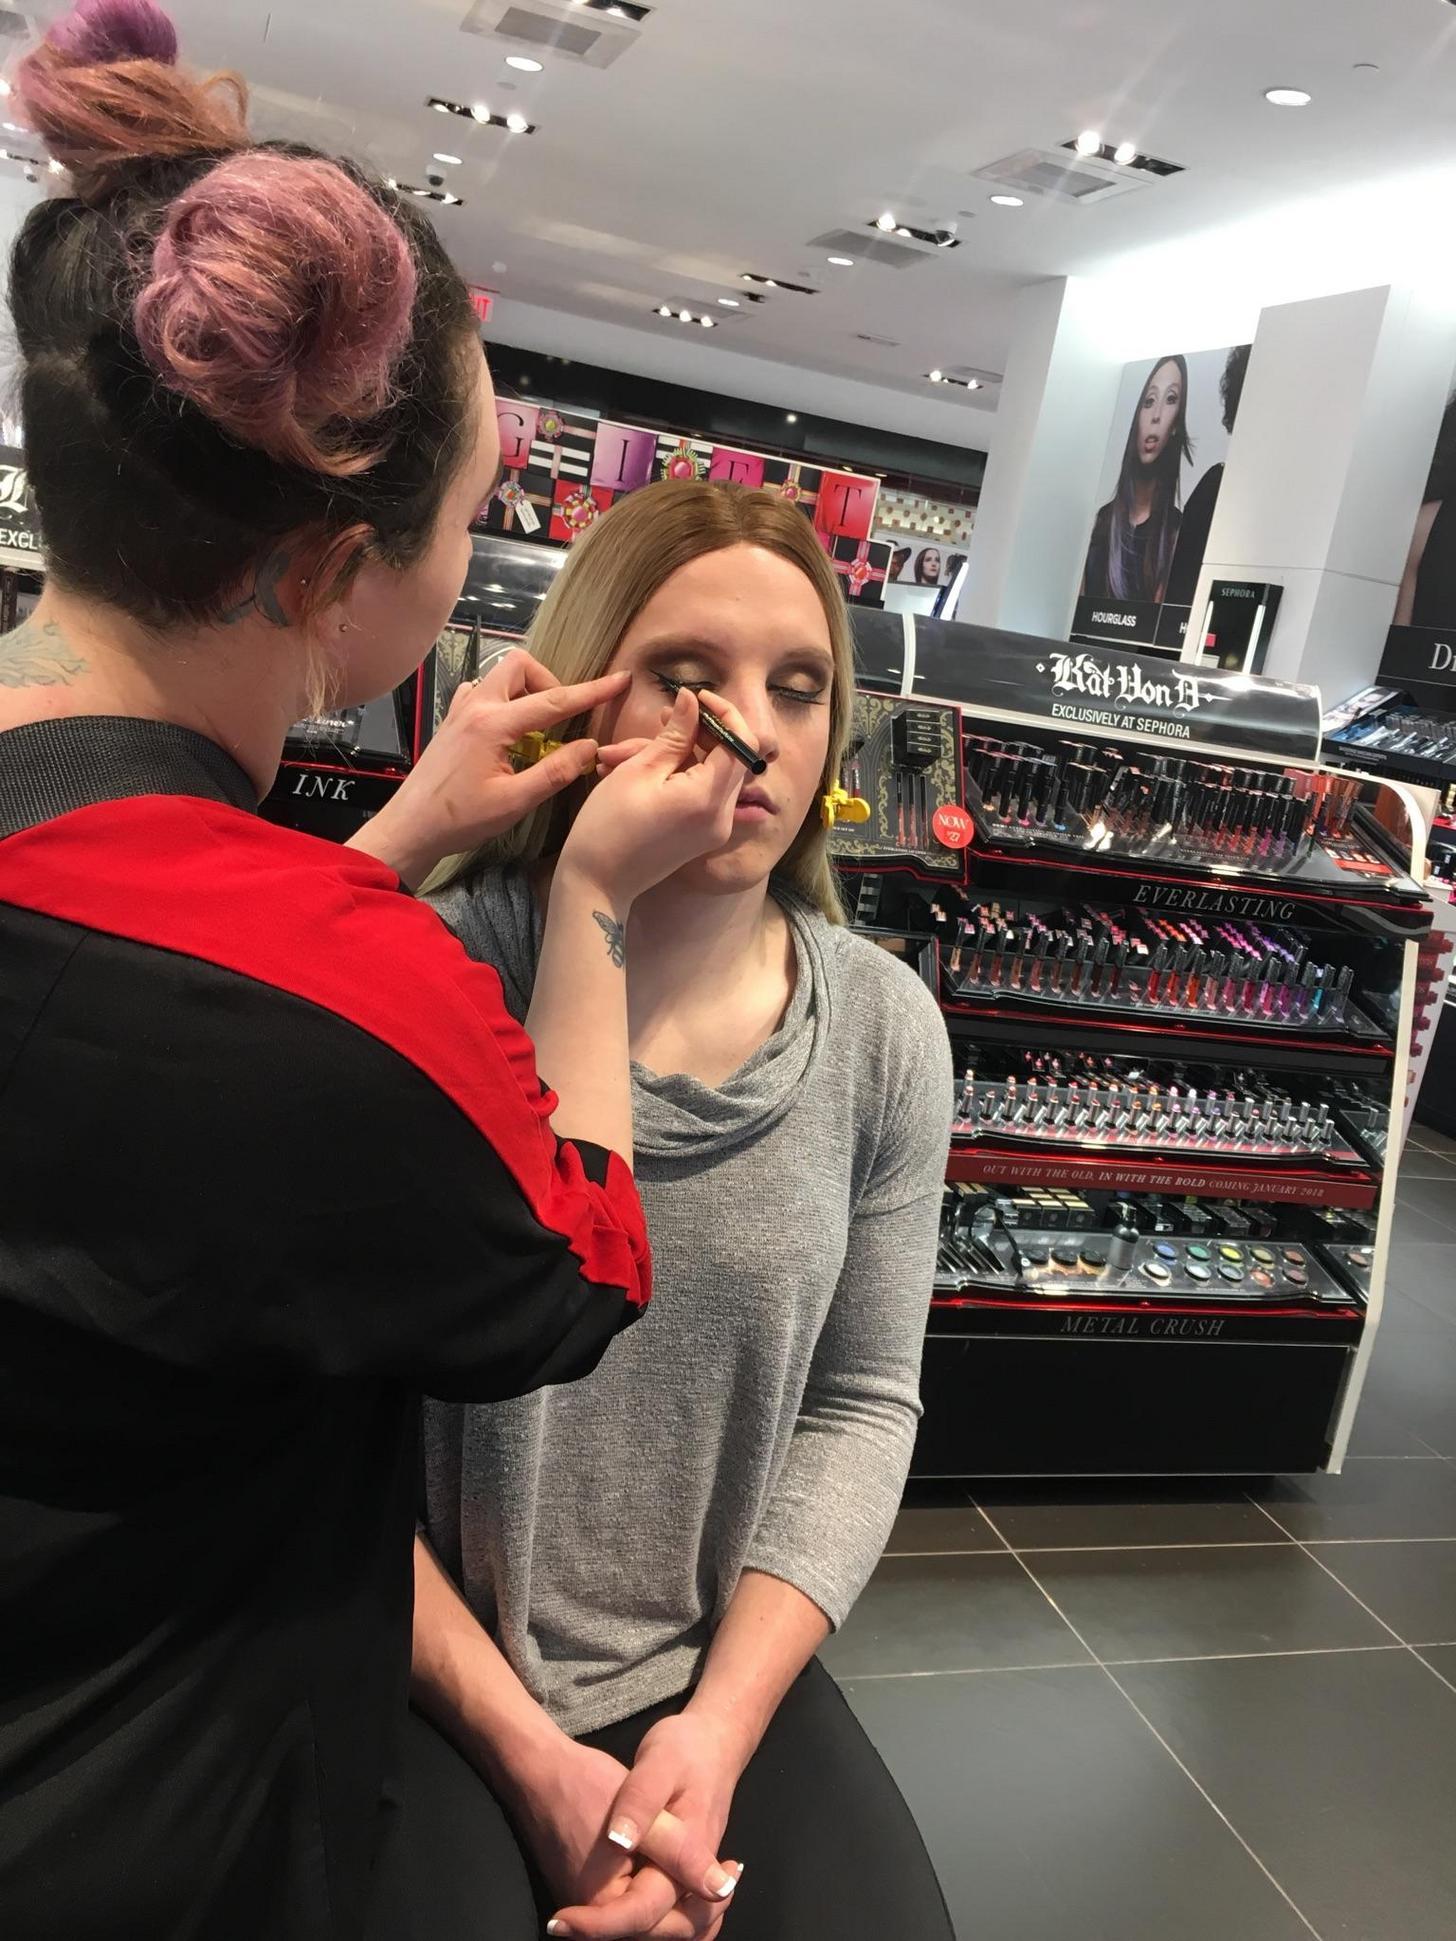 Went to Sephora for a makeover! : crossdressing